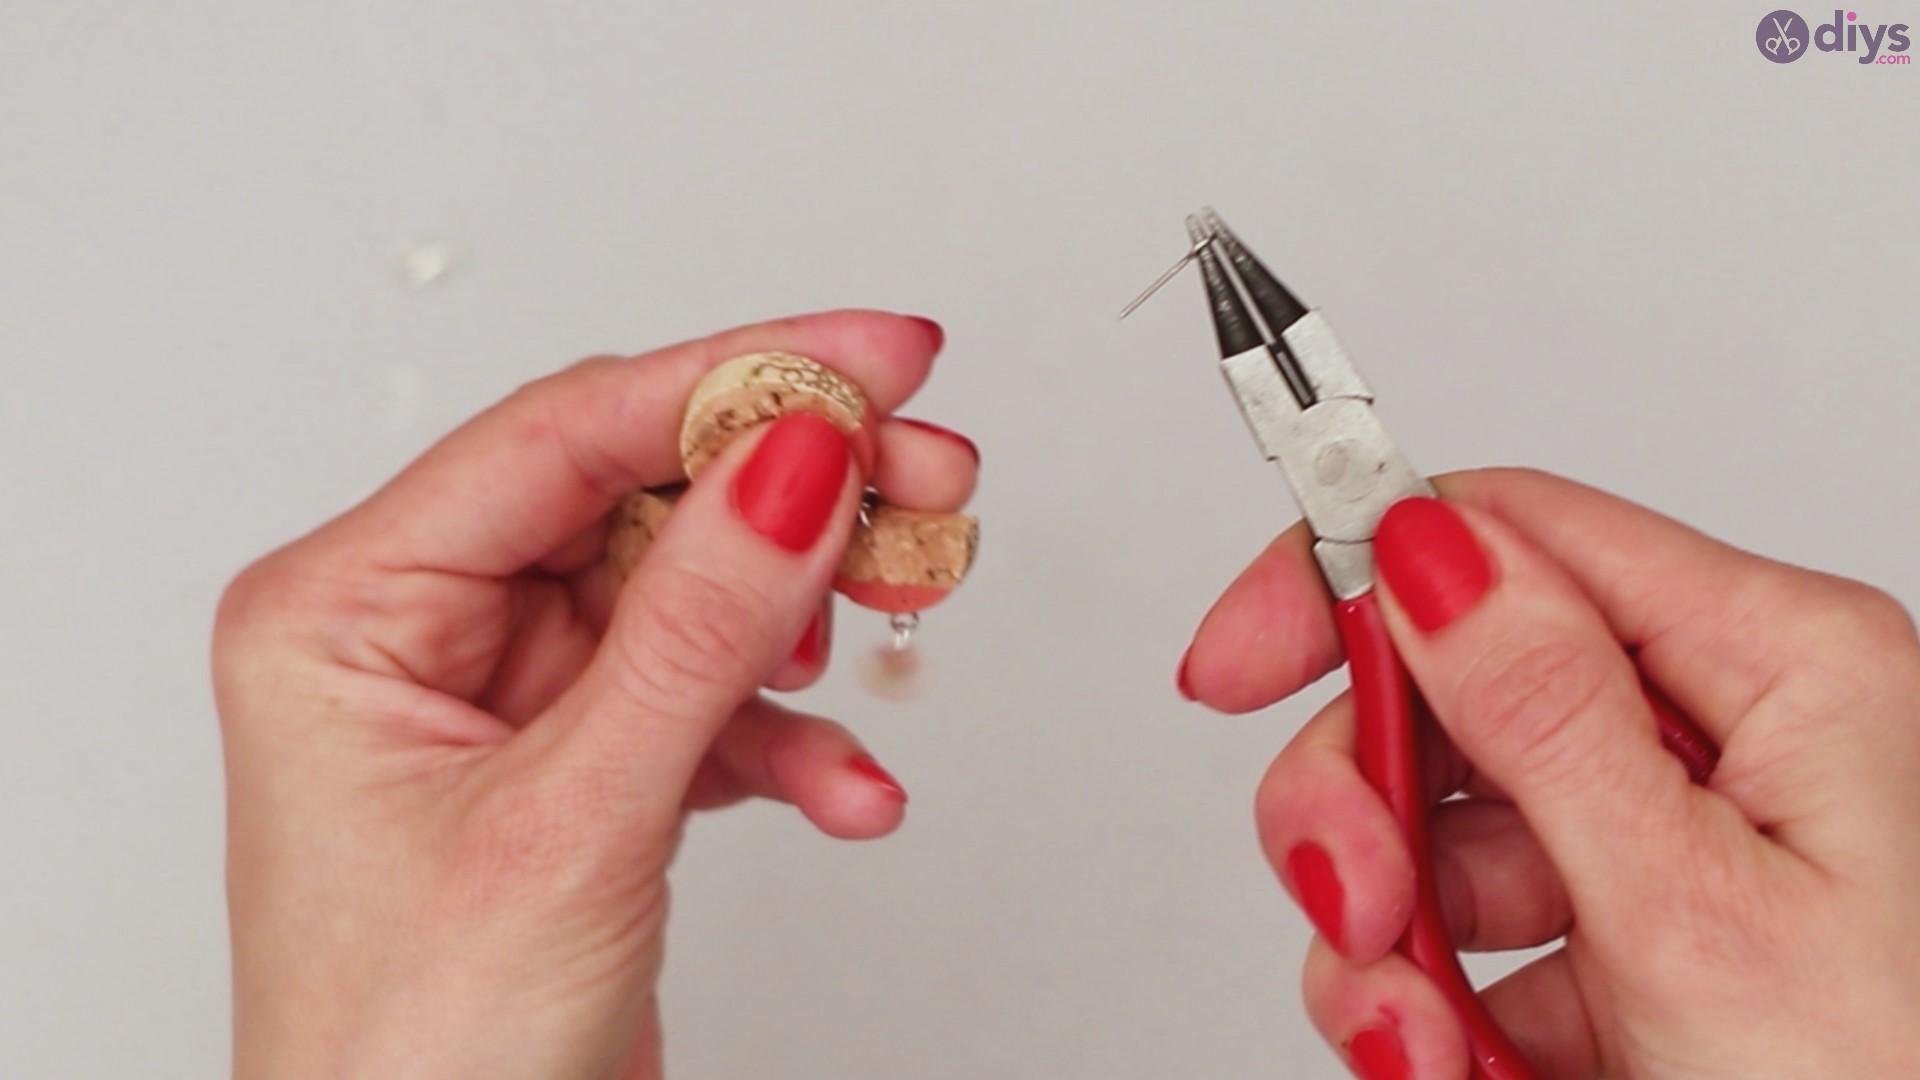 Diy wine cork necklace (37)